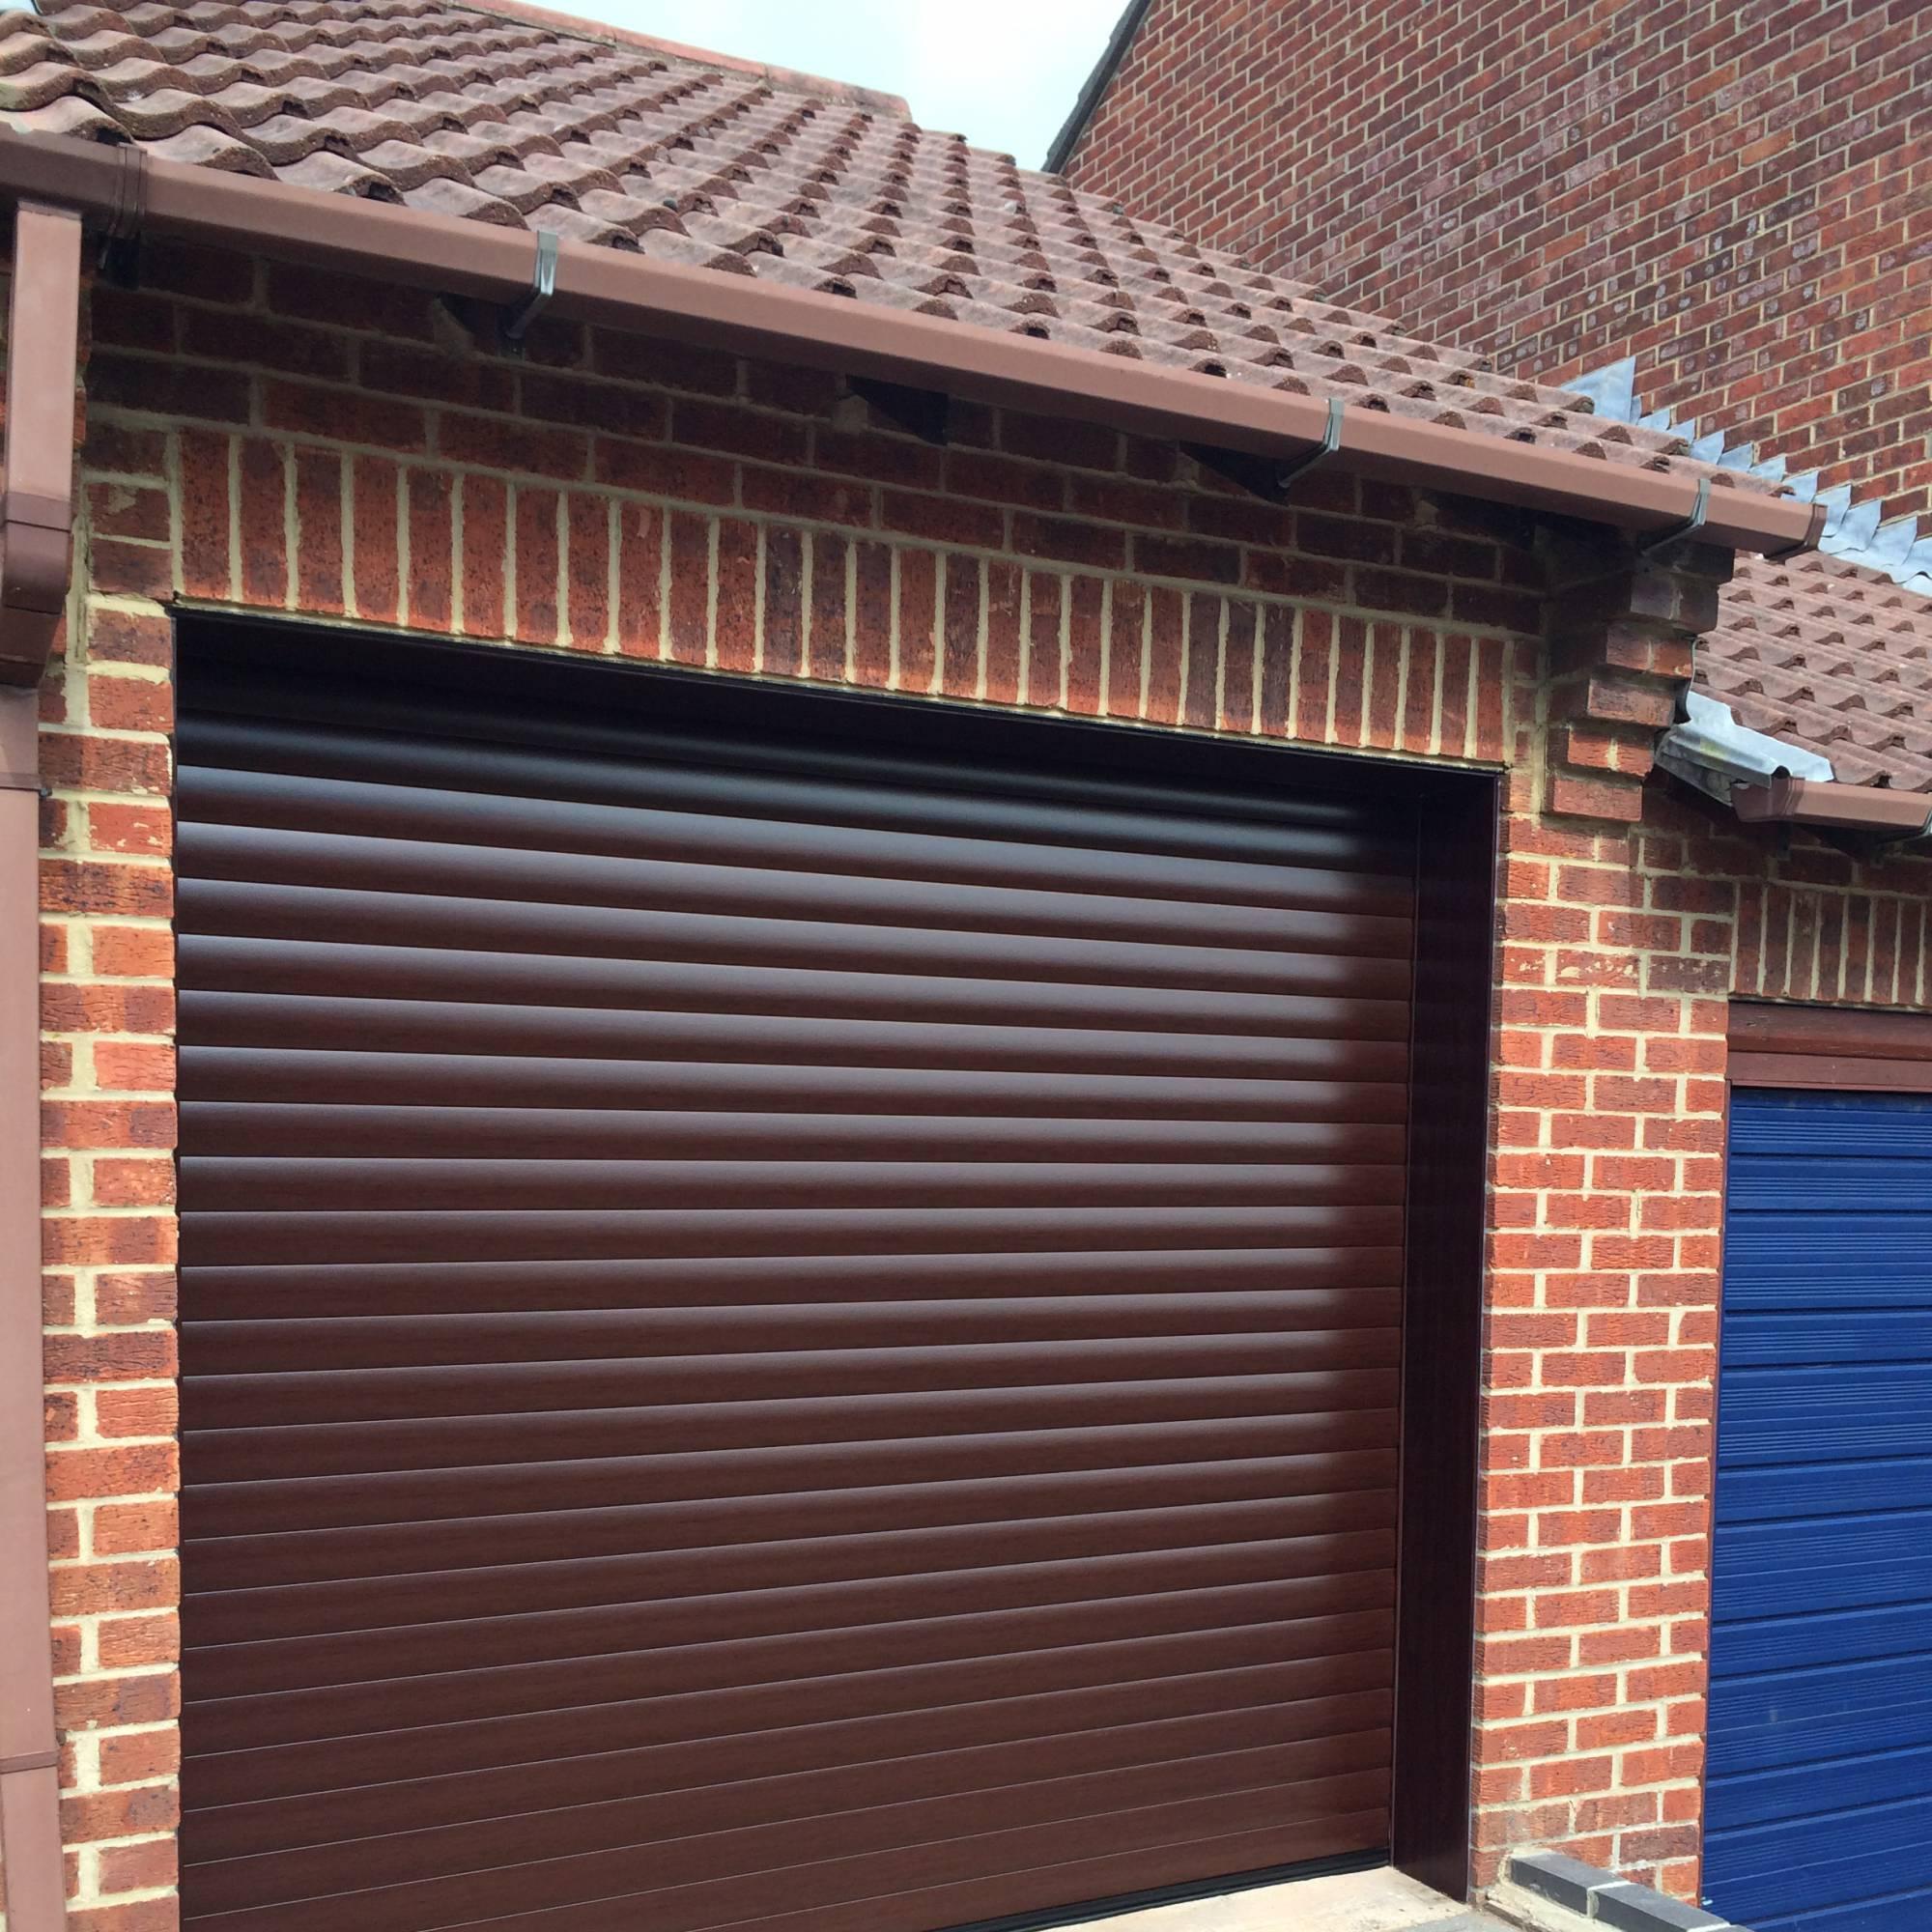 rollmatic hormann garage doors in rosewood. Black Bedroom Furniture Sets. Home Design Ideas